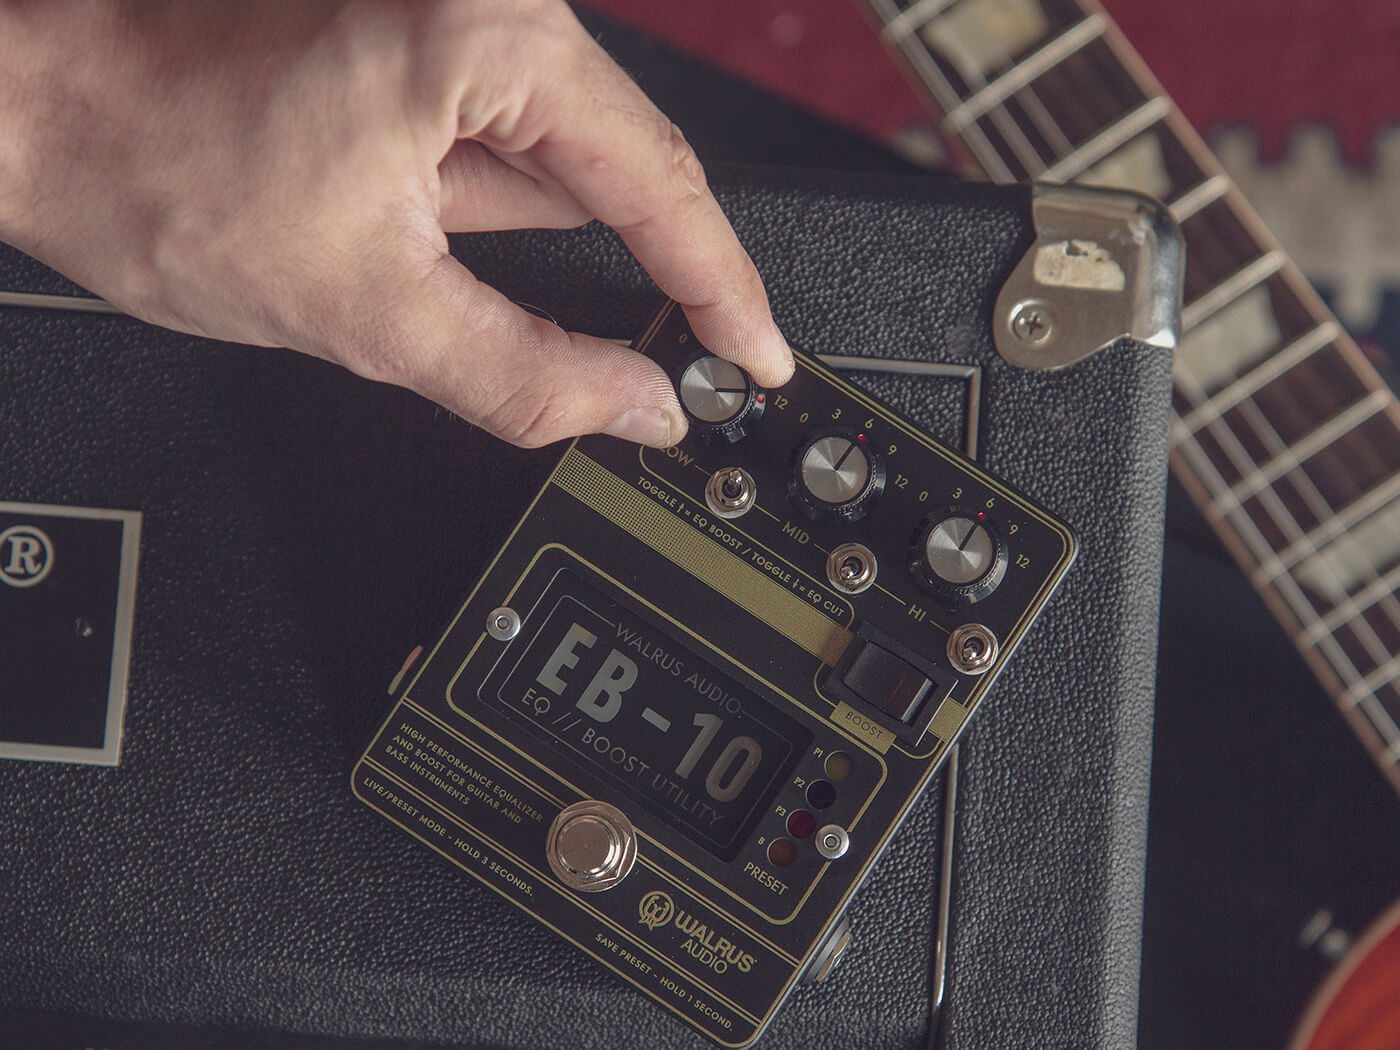 Walrus audio EB-10